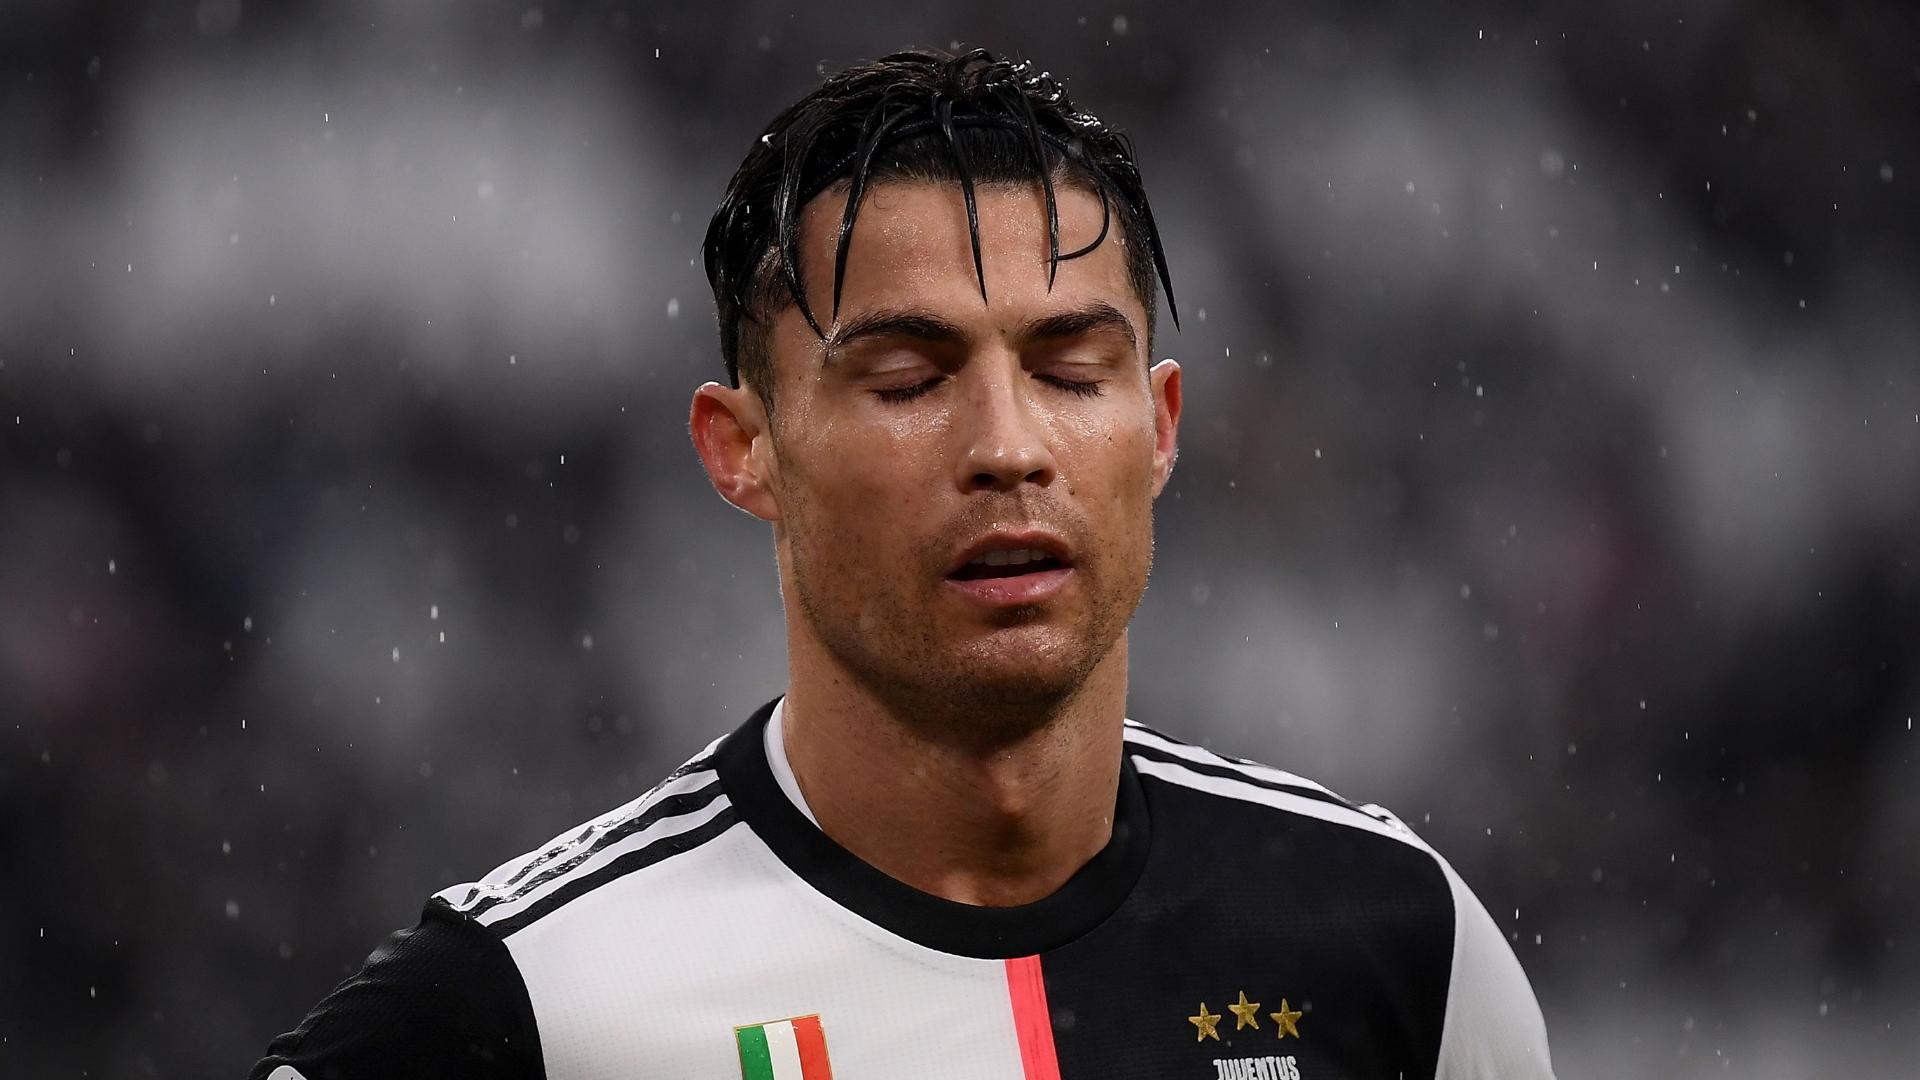 'Ronaldo is still the best ever!' - Agent Mendes backs Portuguese star following Messi's Ballon d'Or triumph